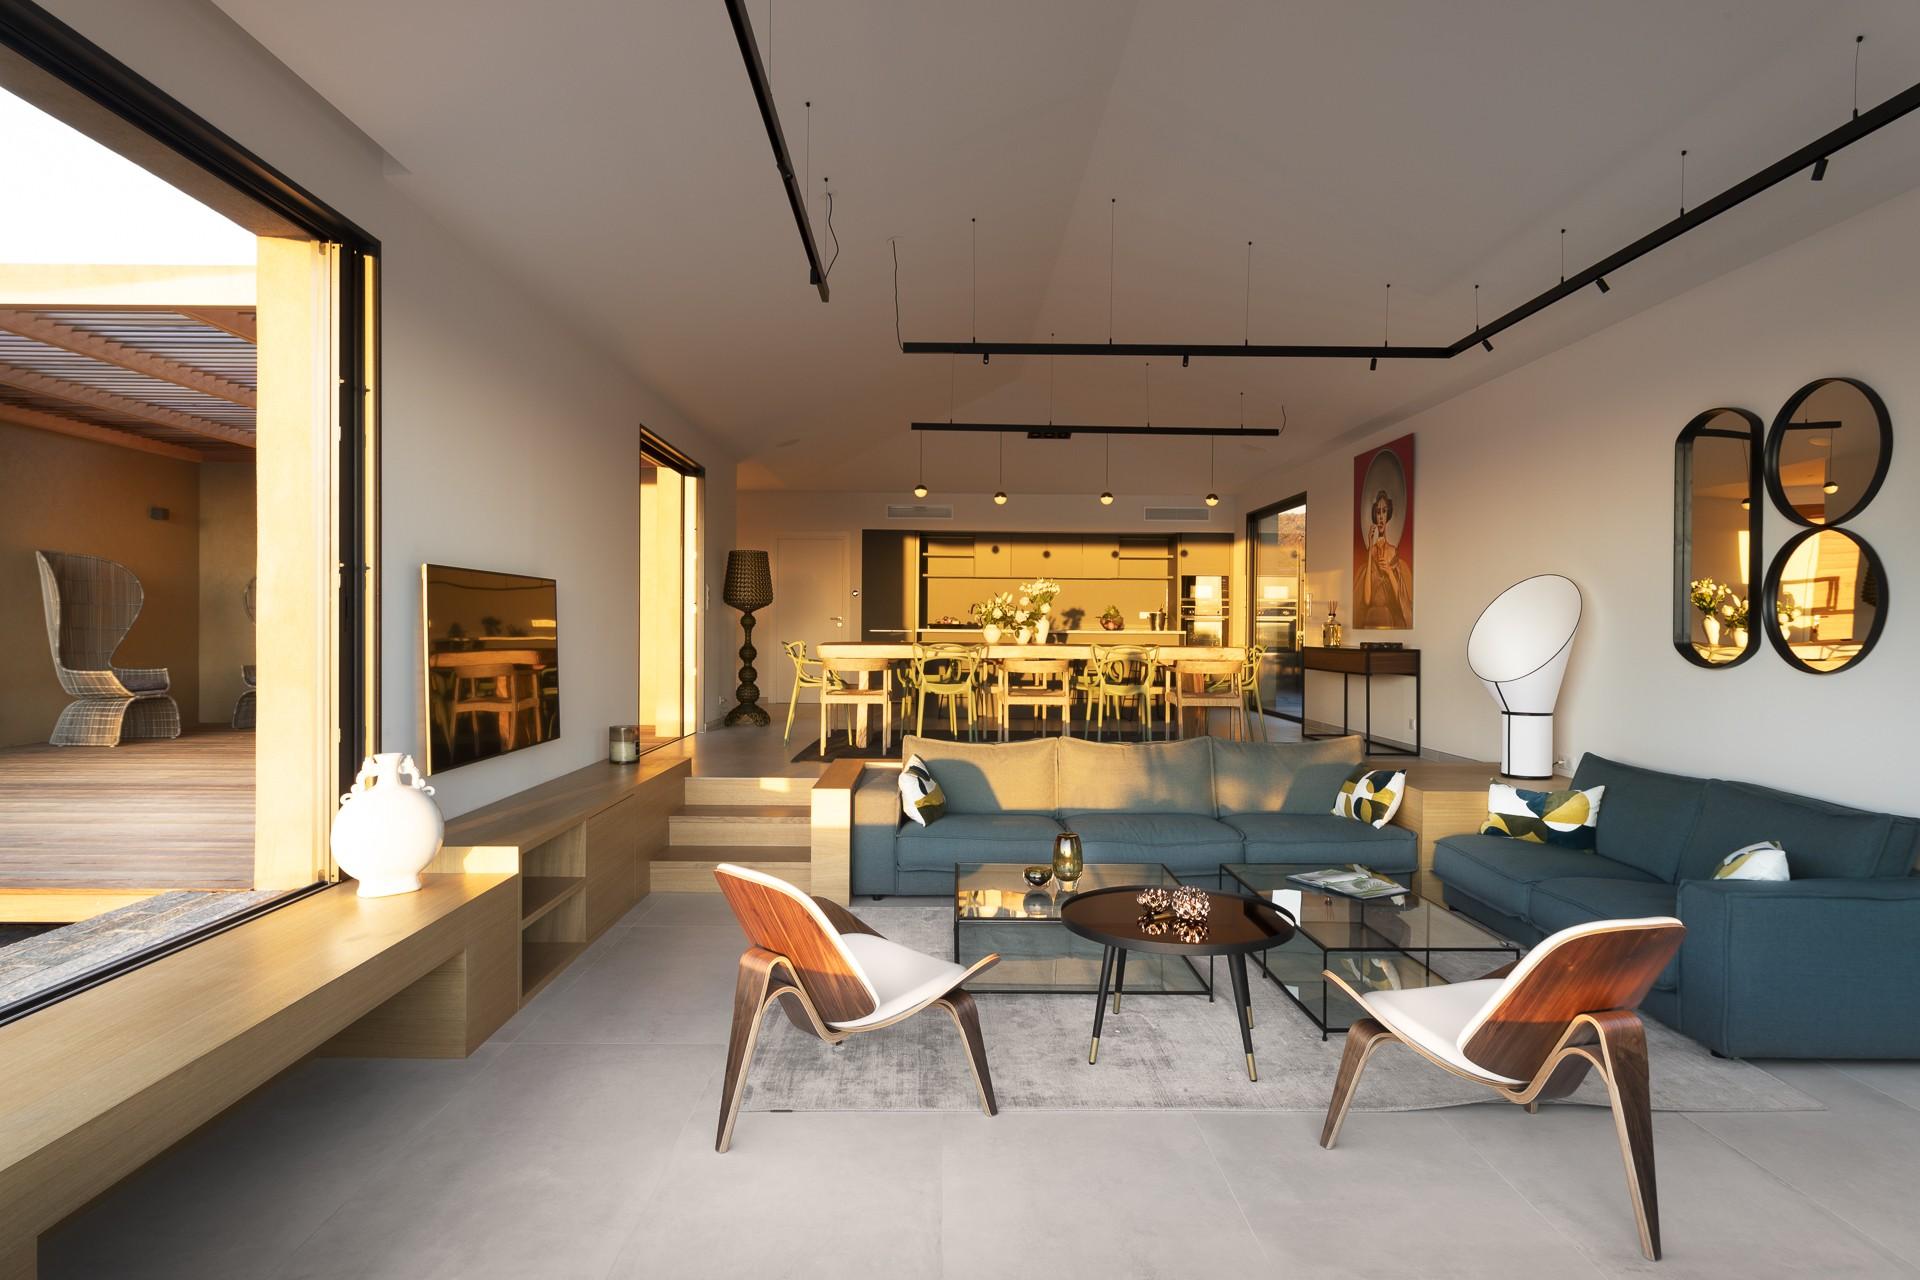 Porto Vecchio Luxury Rental Villa Perle Living Room 4